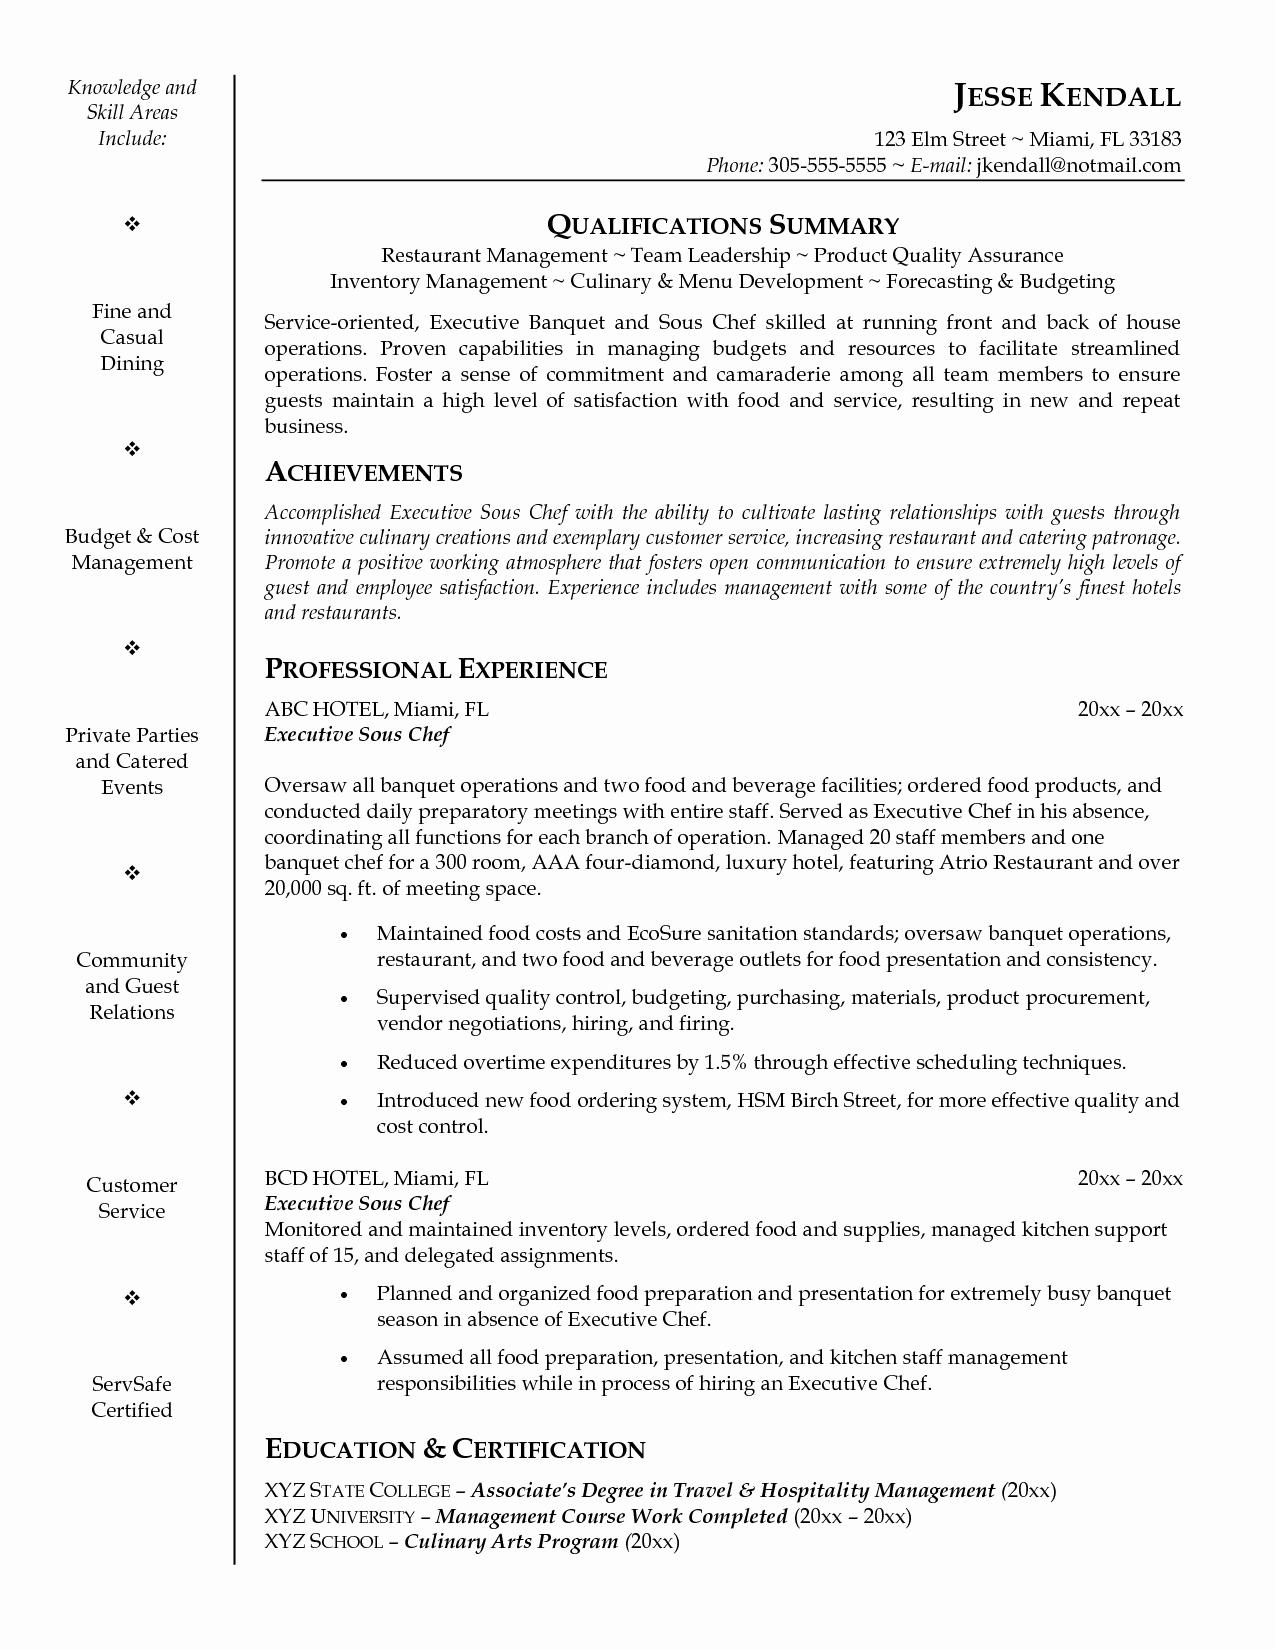 30 Executive sous Chef Job Description | Example Document ...